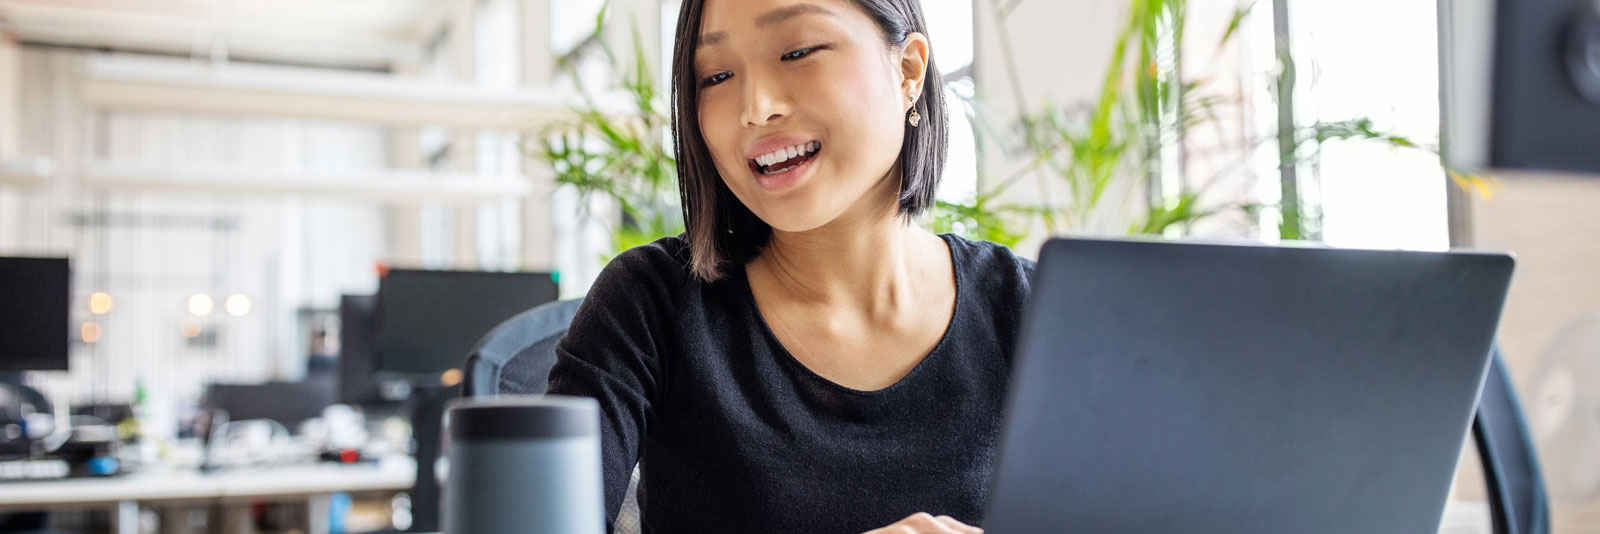 How to Hire Customer Service ...roberthalf.com